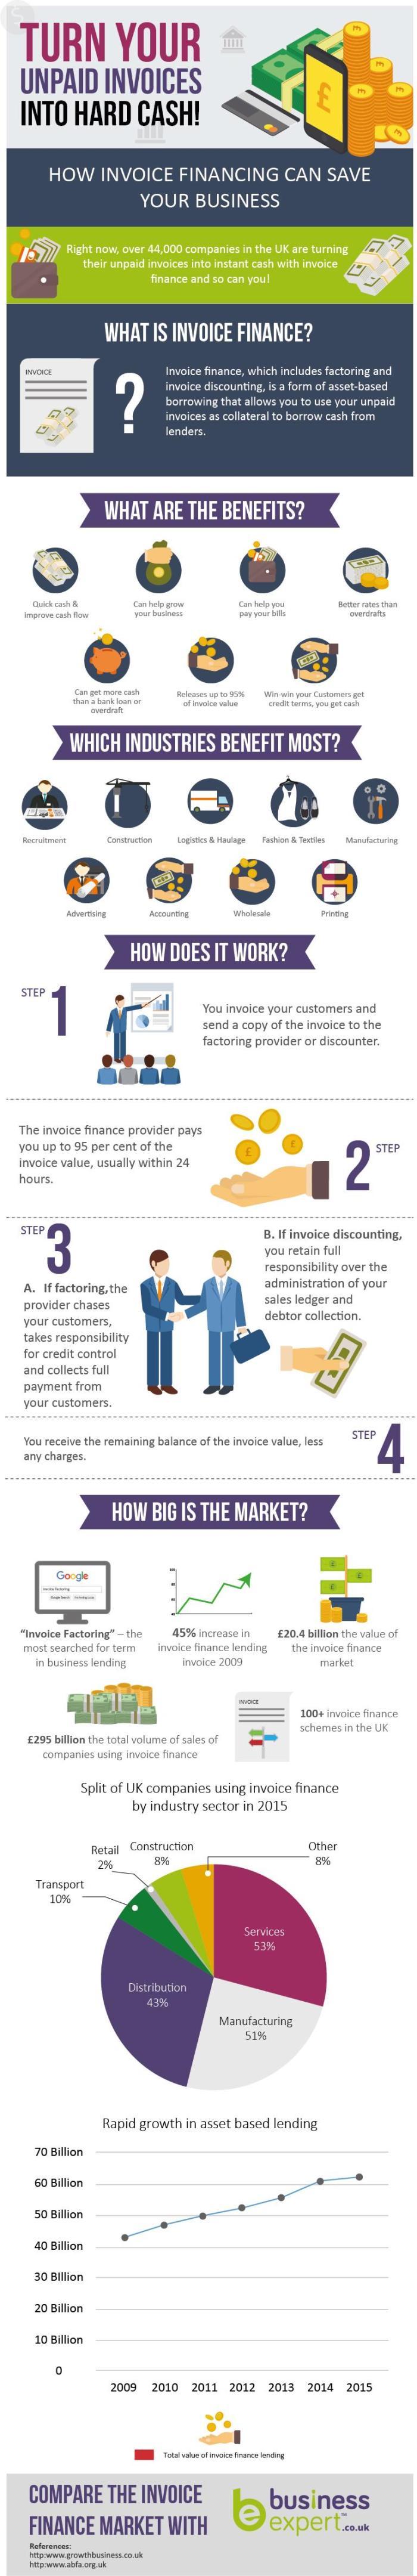 Invoice Finance Infographic